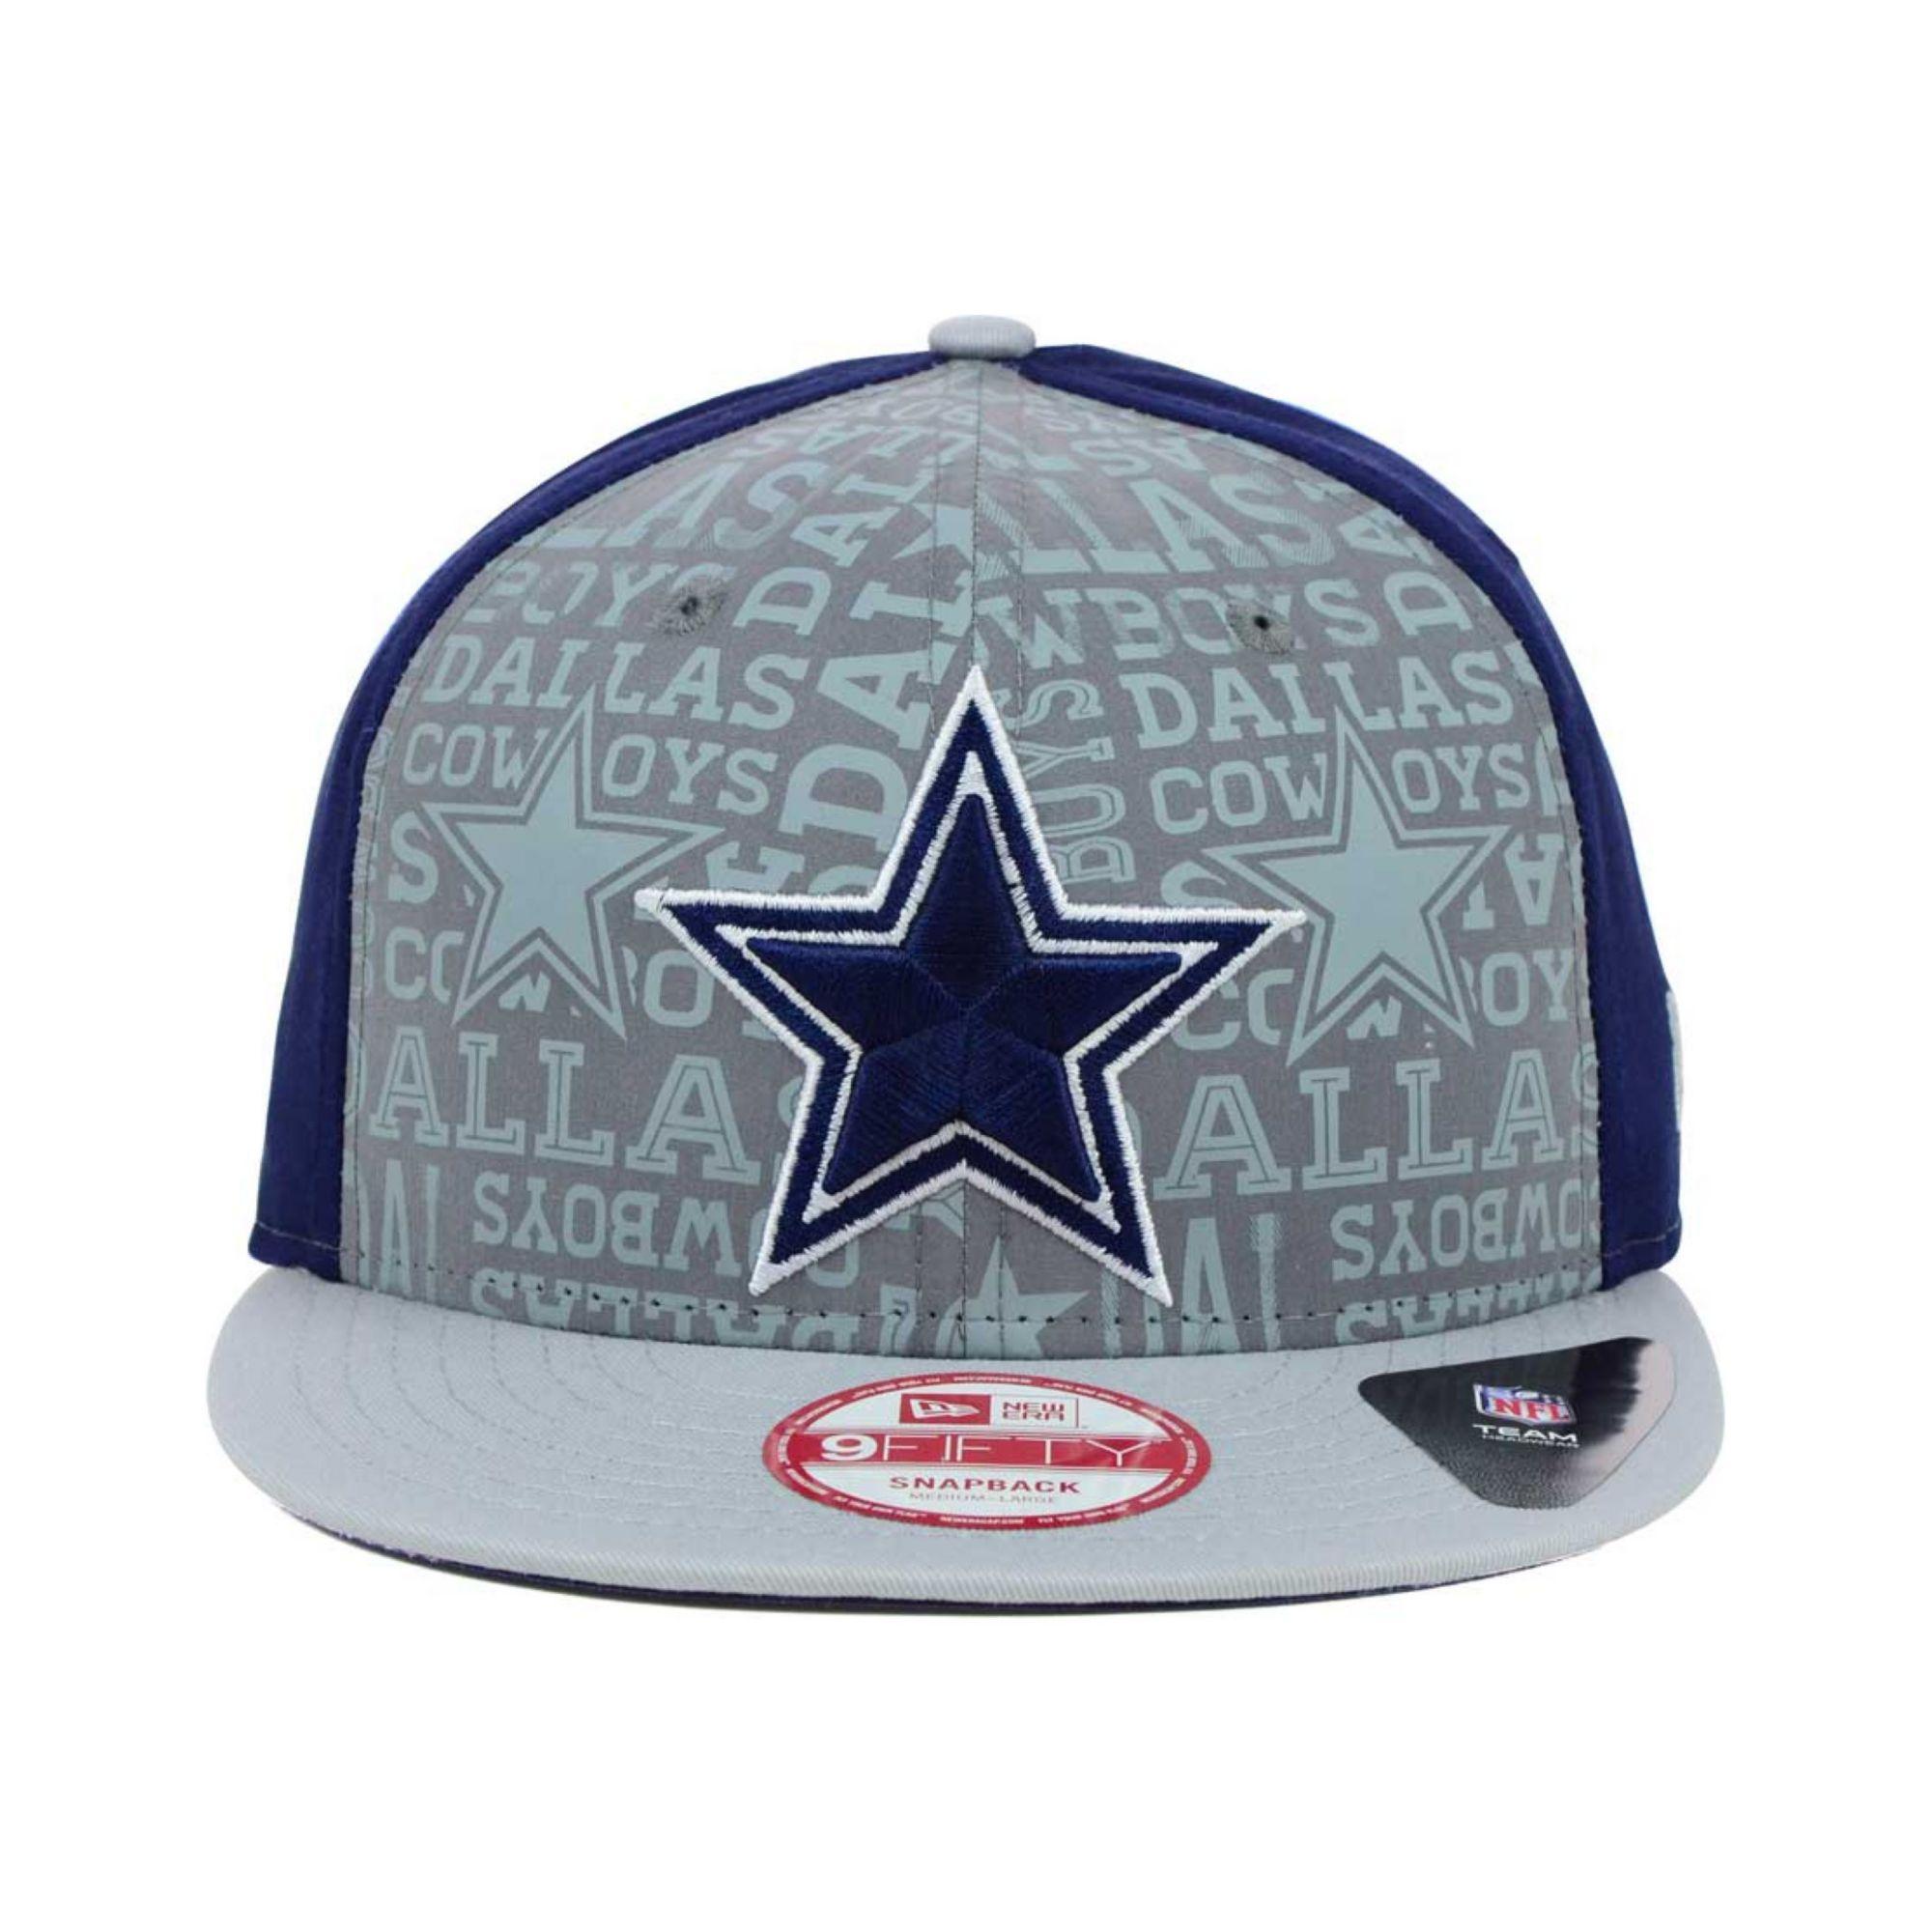 0c4ddf9cc KTZ Dallas Cowboys Nfl Draft 9fifty Snapback Cap in Gray for Men - Lyst